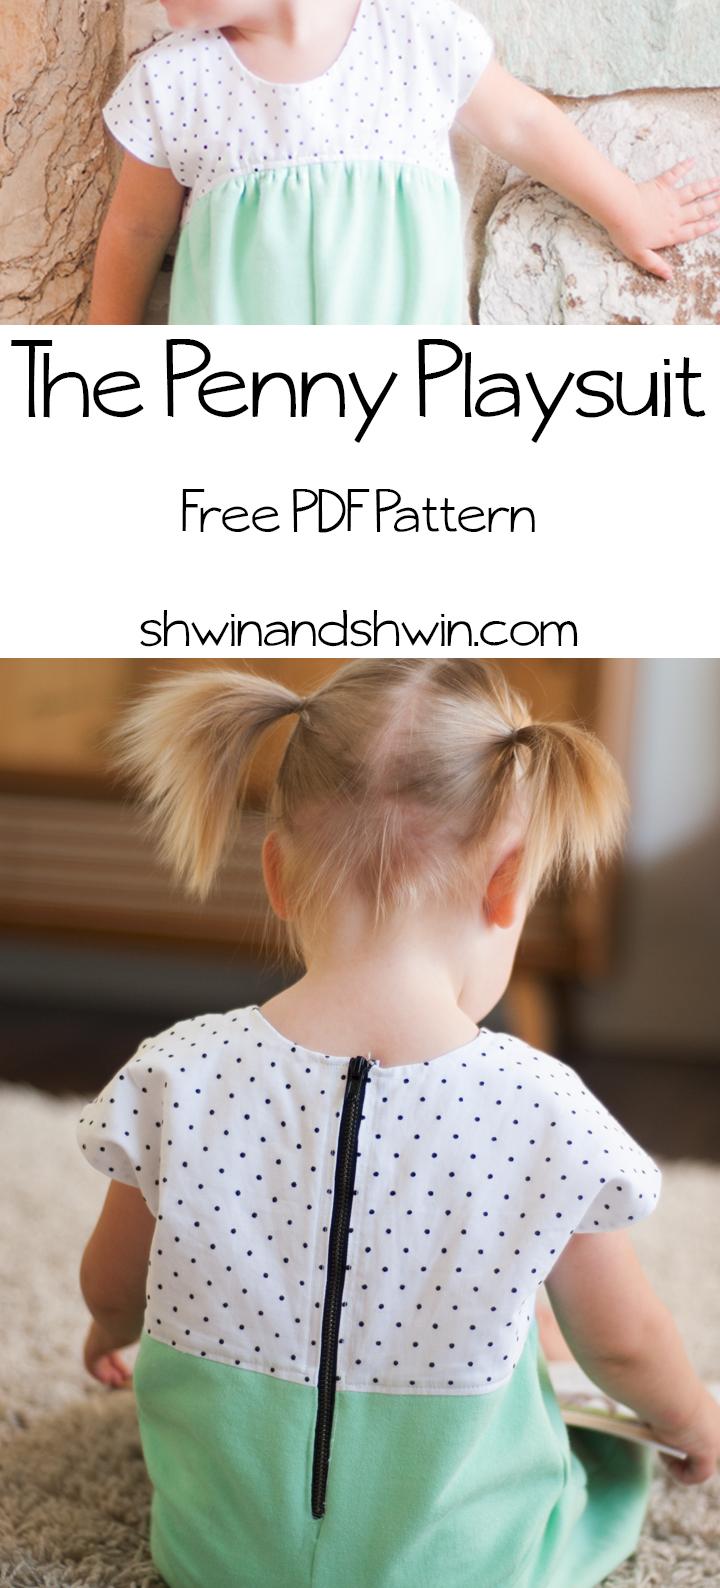 The Penny Playsuit    Free PDF Pattern    Shwin&Shwin